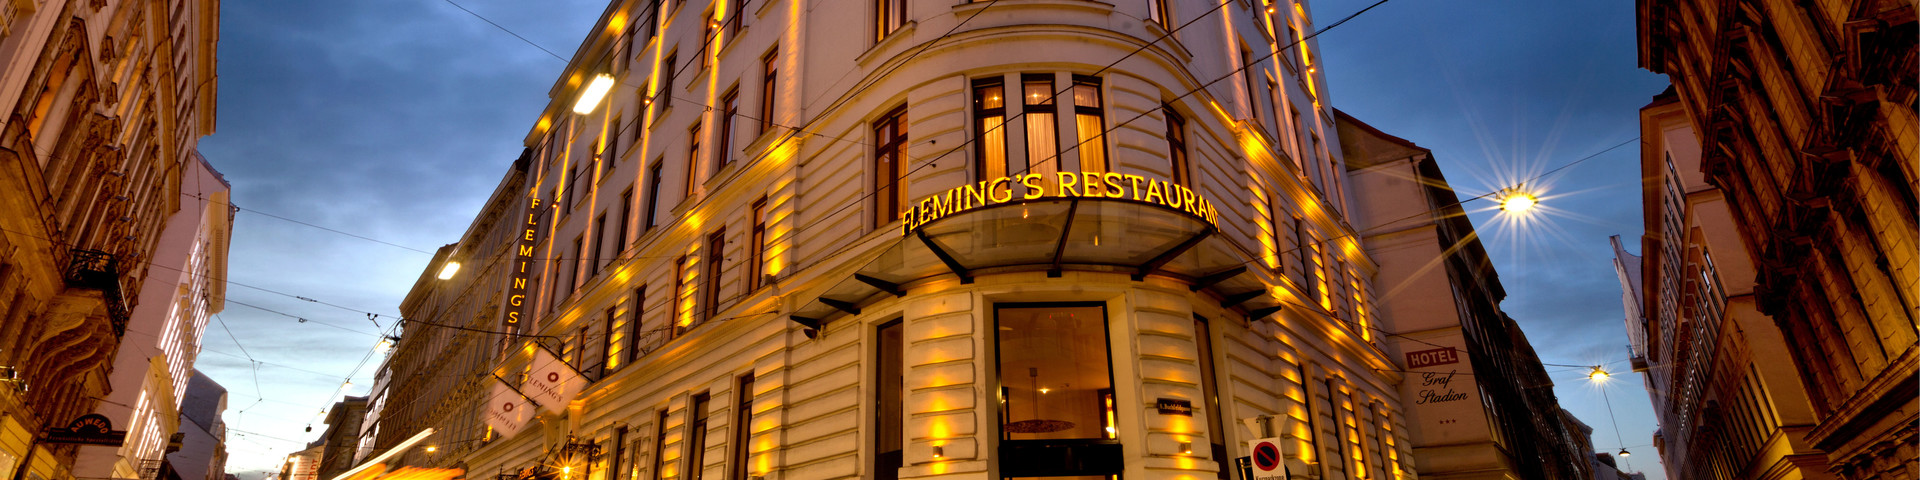 Fleming's Selection Hotel Wien City - Außenansicht Nacht © Fleming's Selection Hotel Wien City